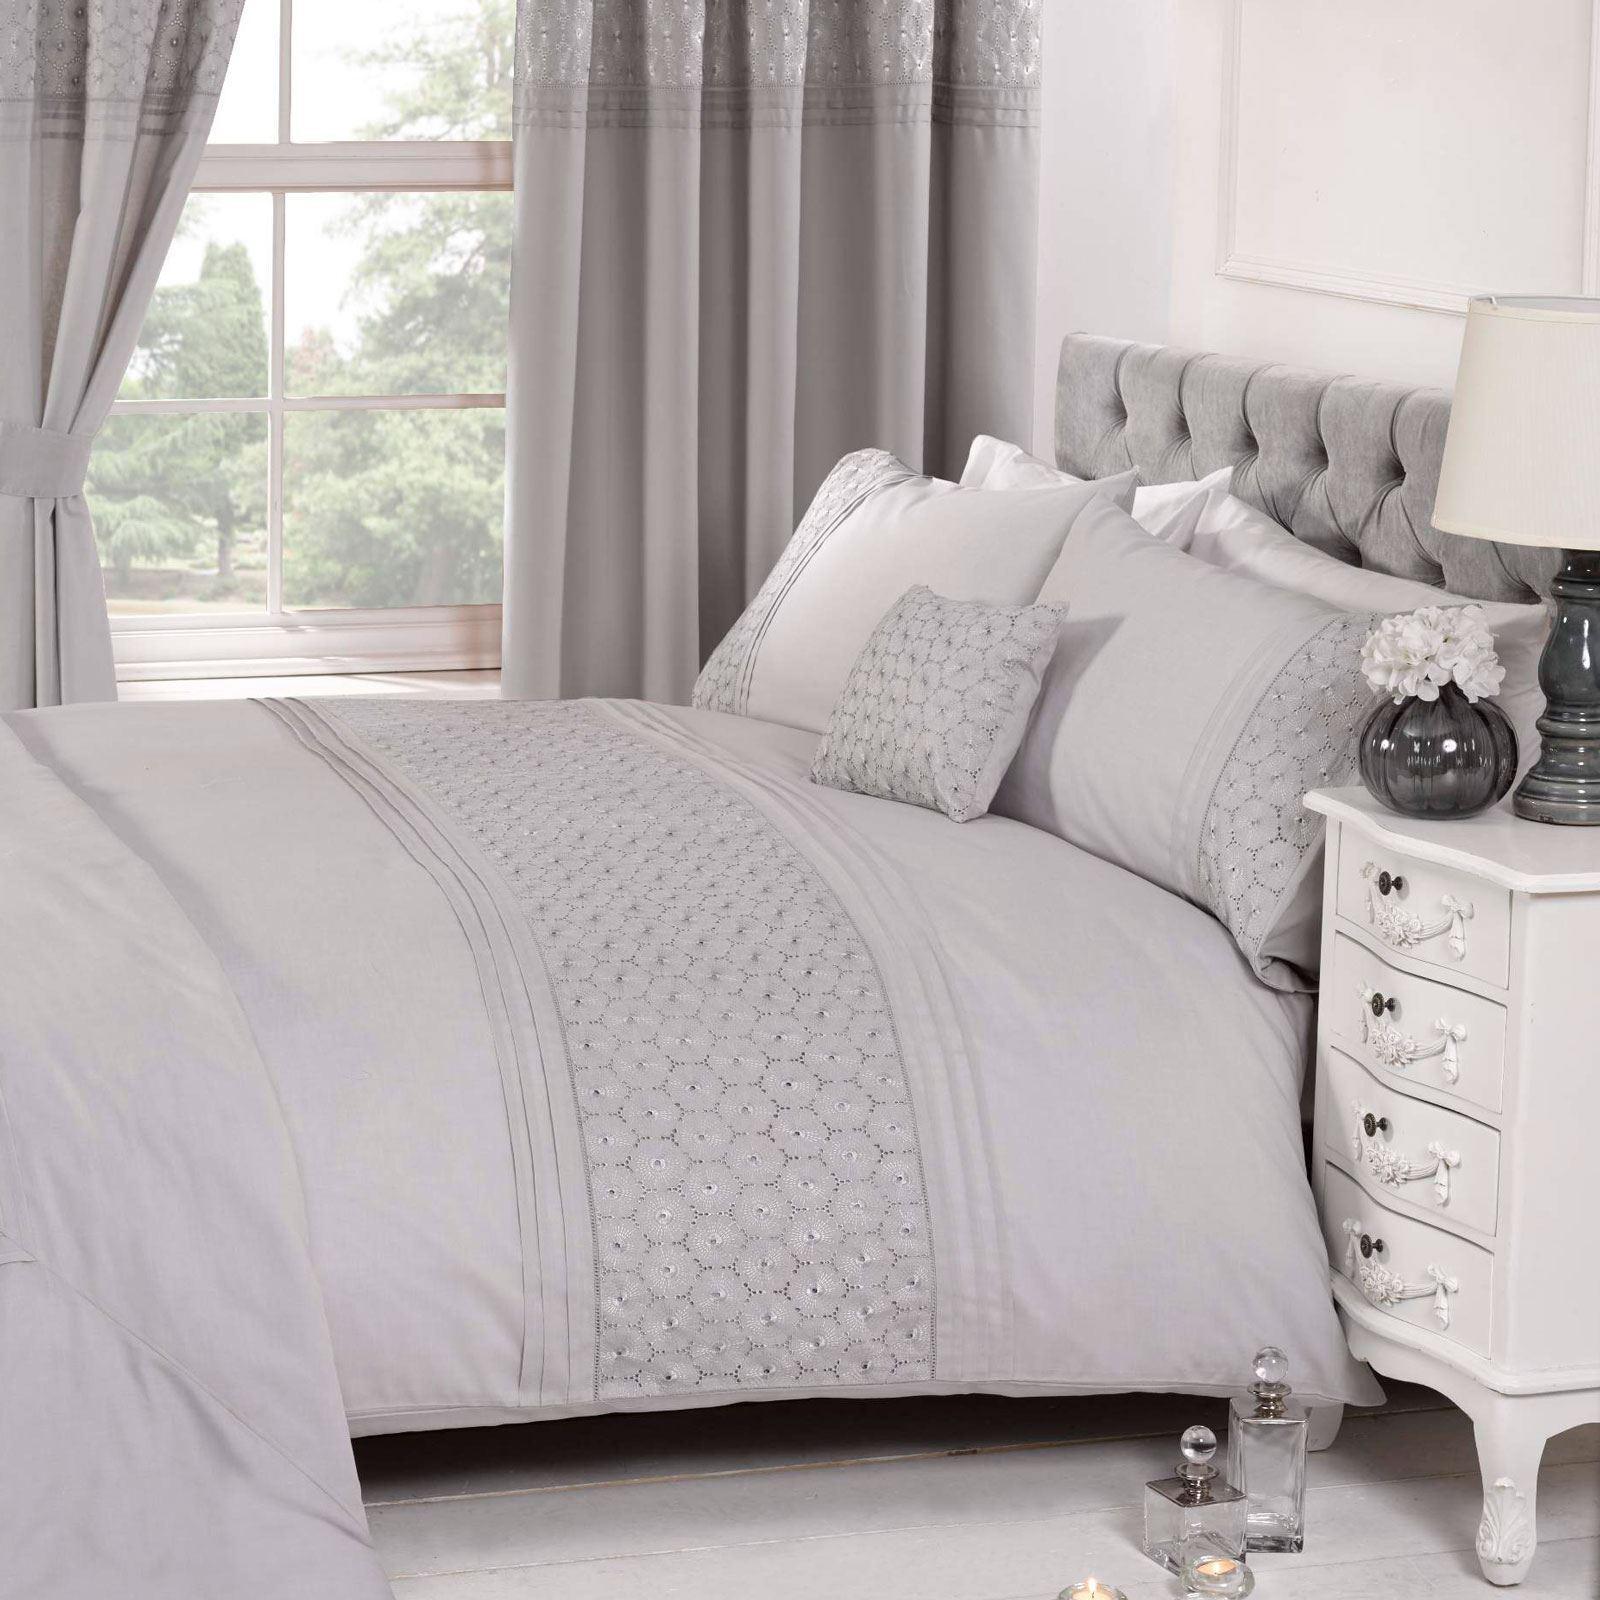 EGrünan Blaumenmuster Grau Bettbezug & Kissenbezug Set Elegant - King Größe | Erlesene Materialien